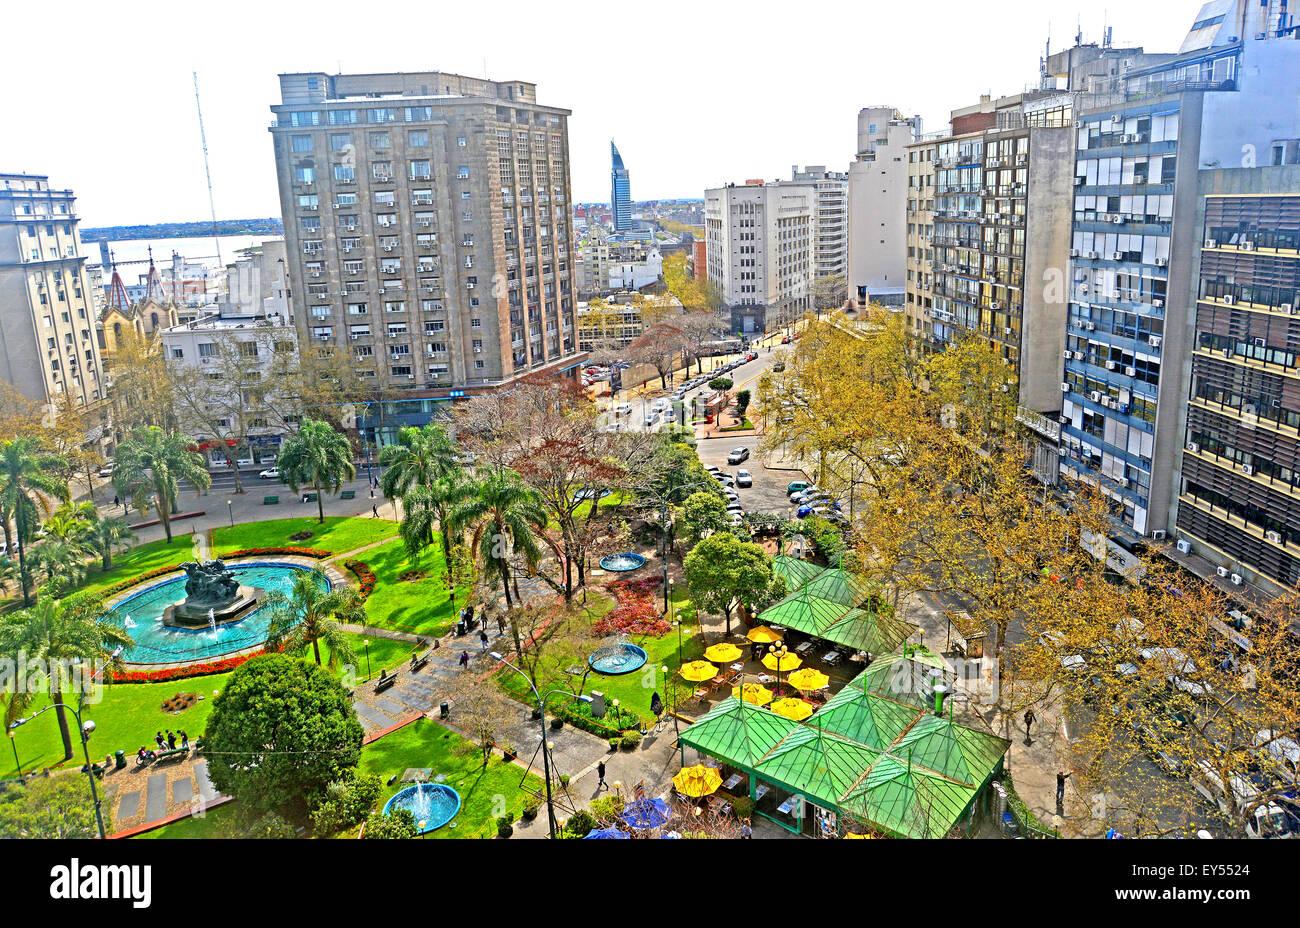 La Plaza Fabini Montevideo Uruguay Imagen De Stock